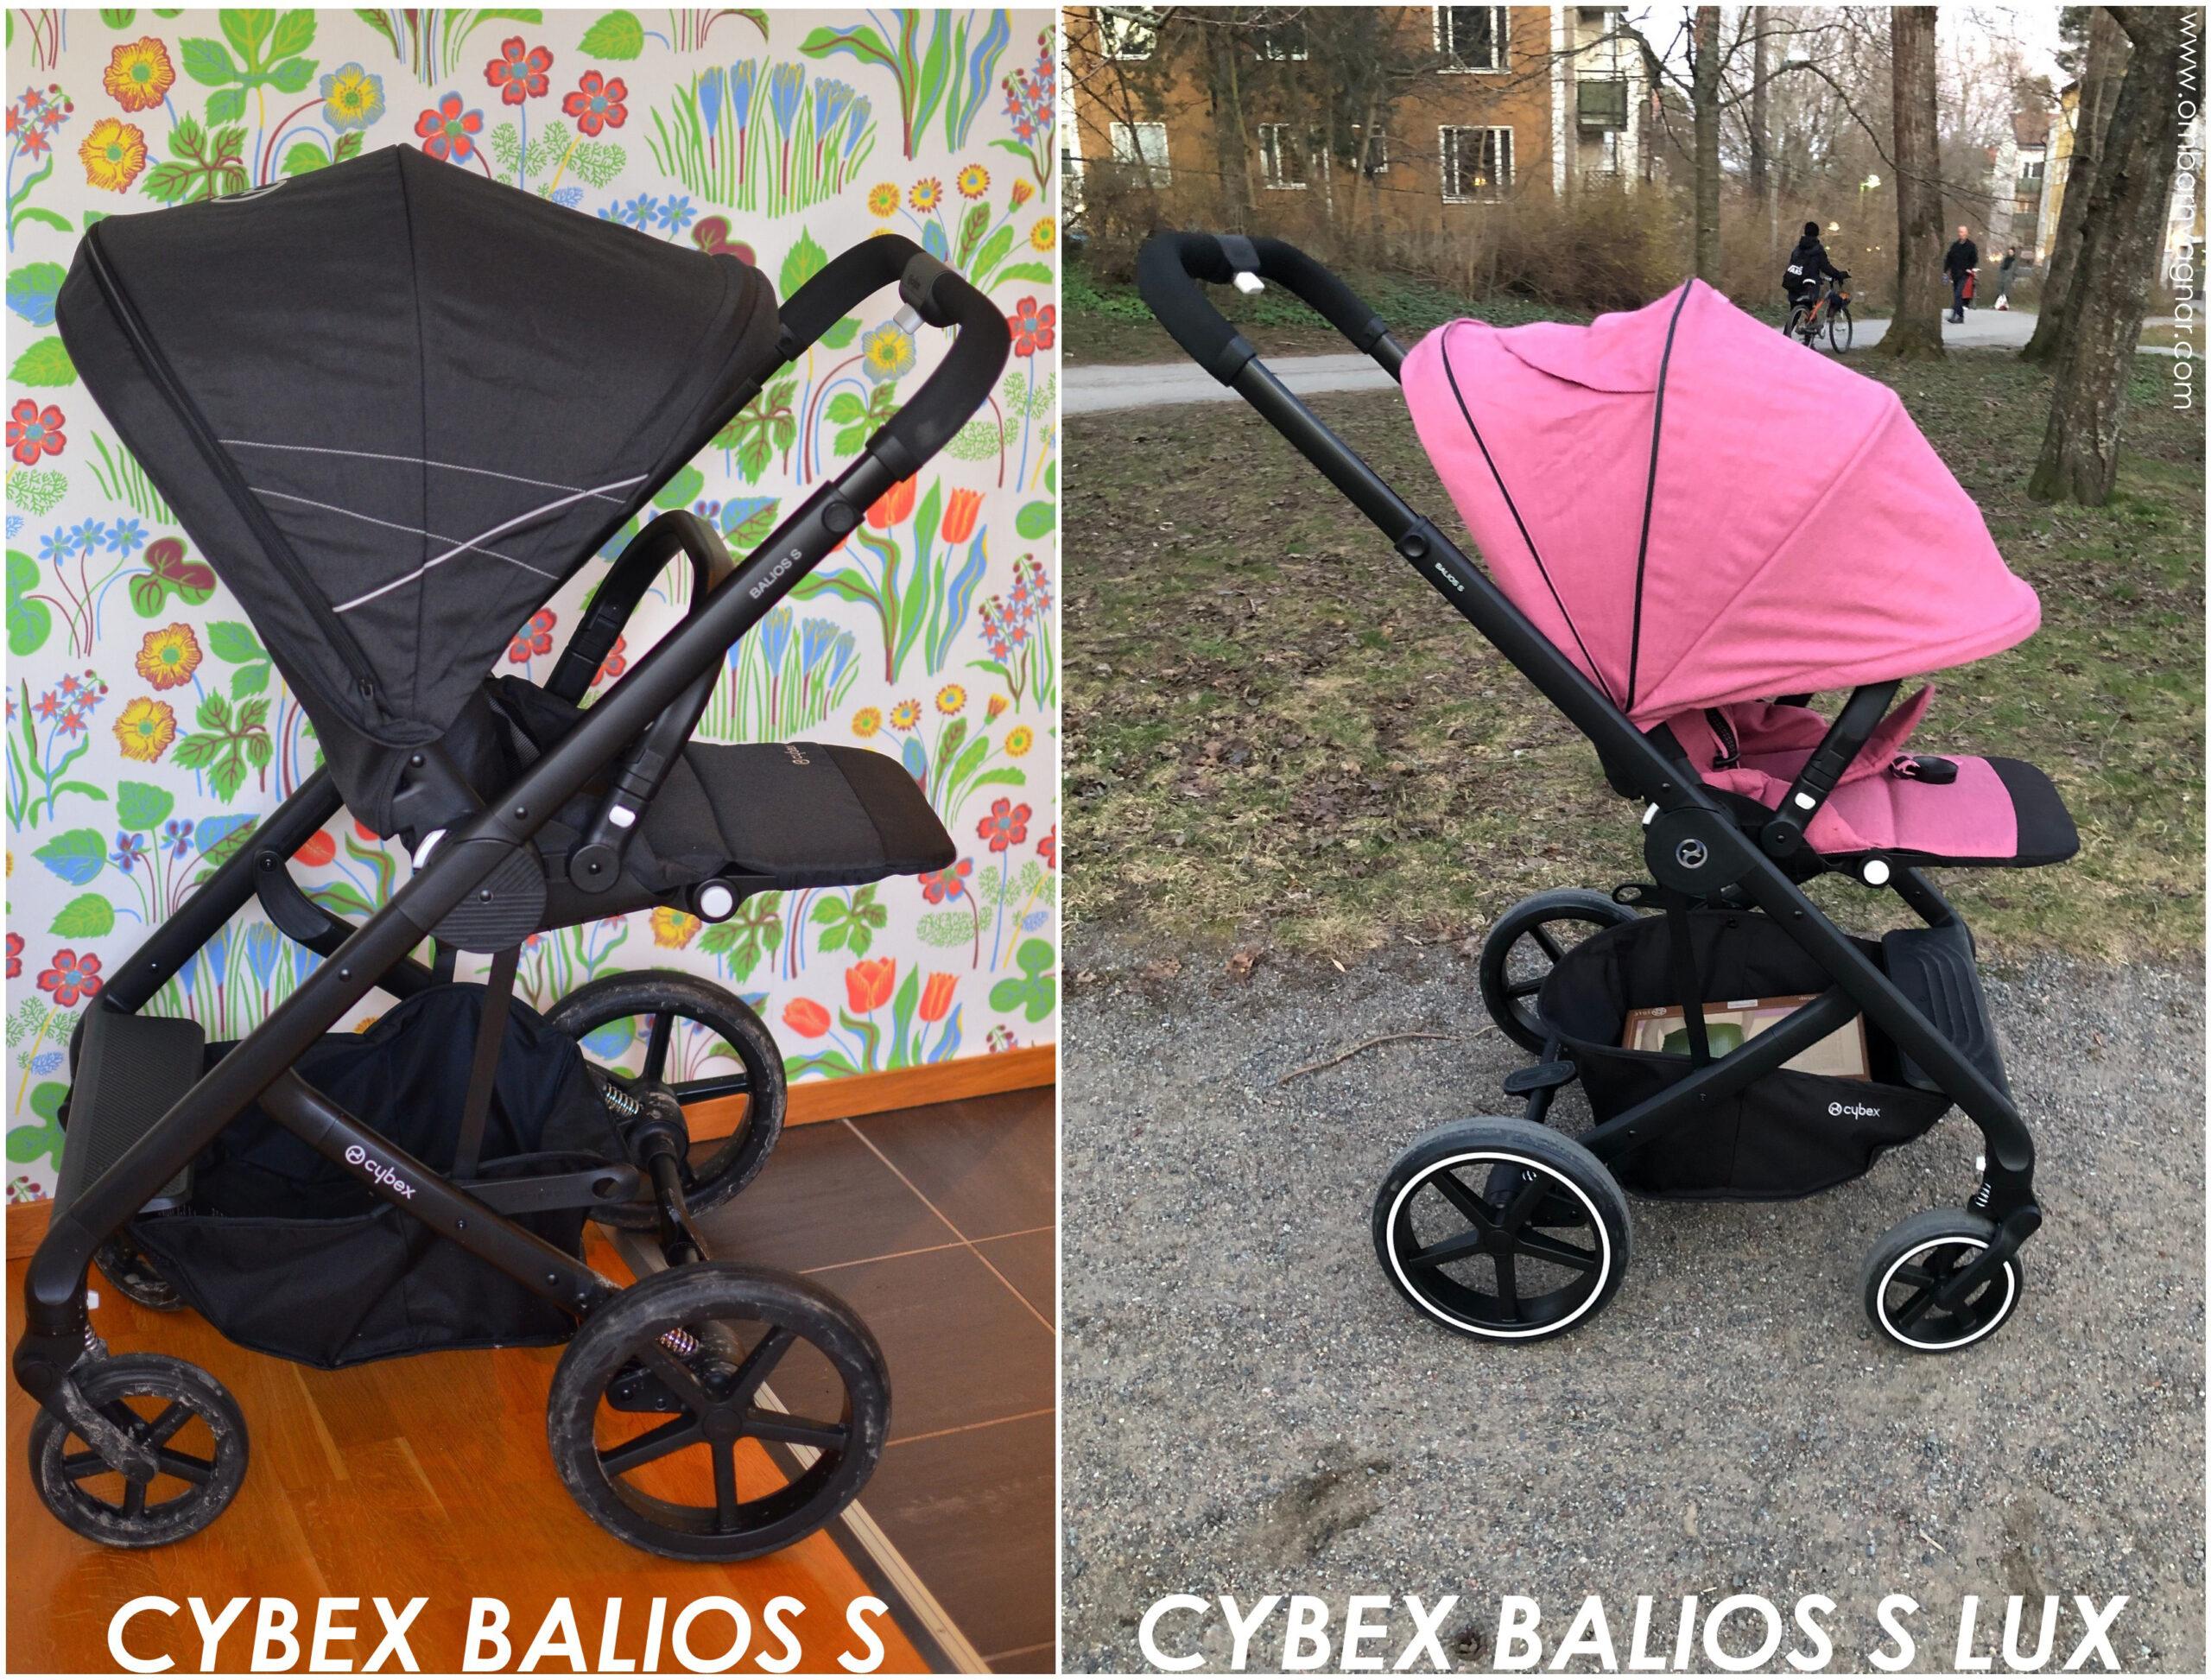 Skillnaden mellan Cybex Balios S och Cybex Balios S Lux